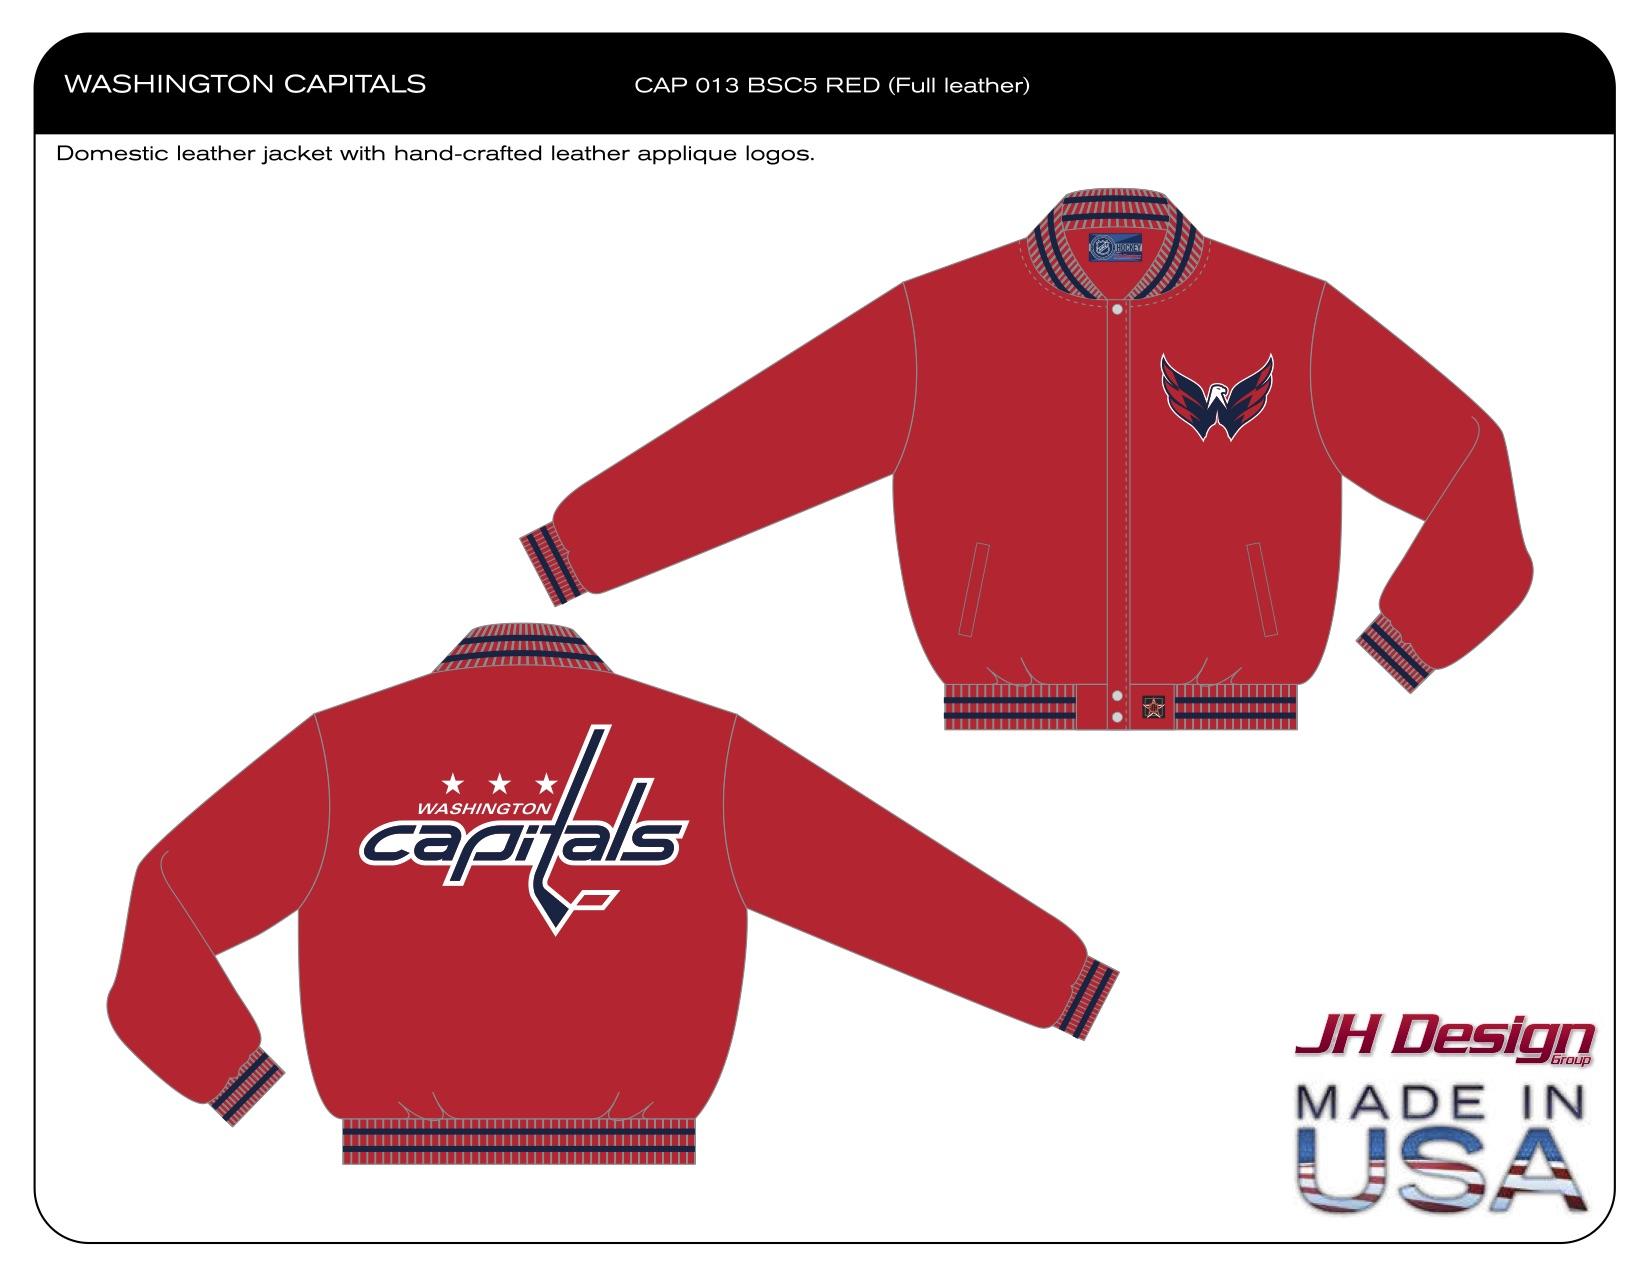 CAP 013 BSC5 RED